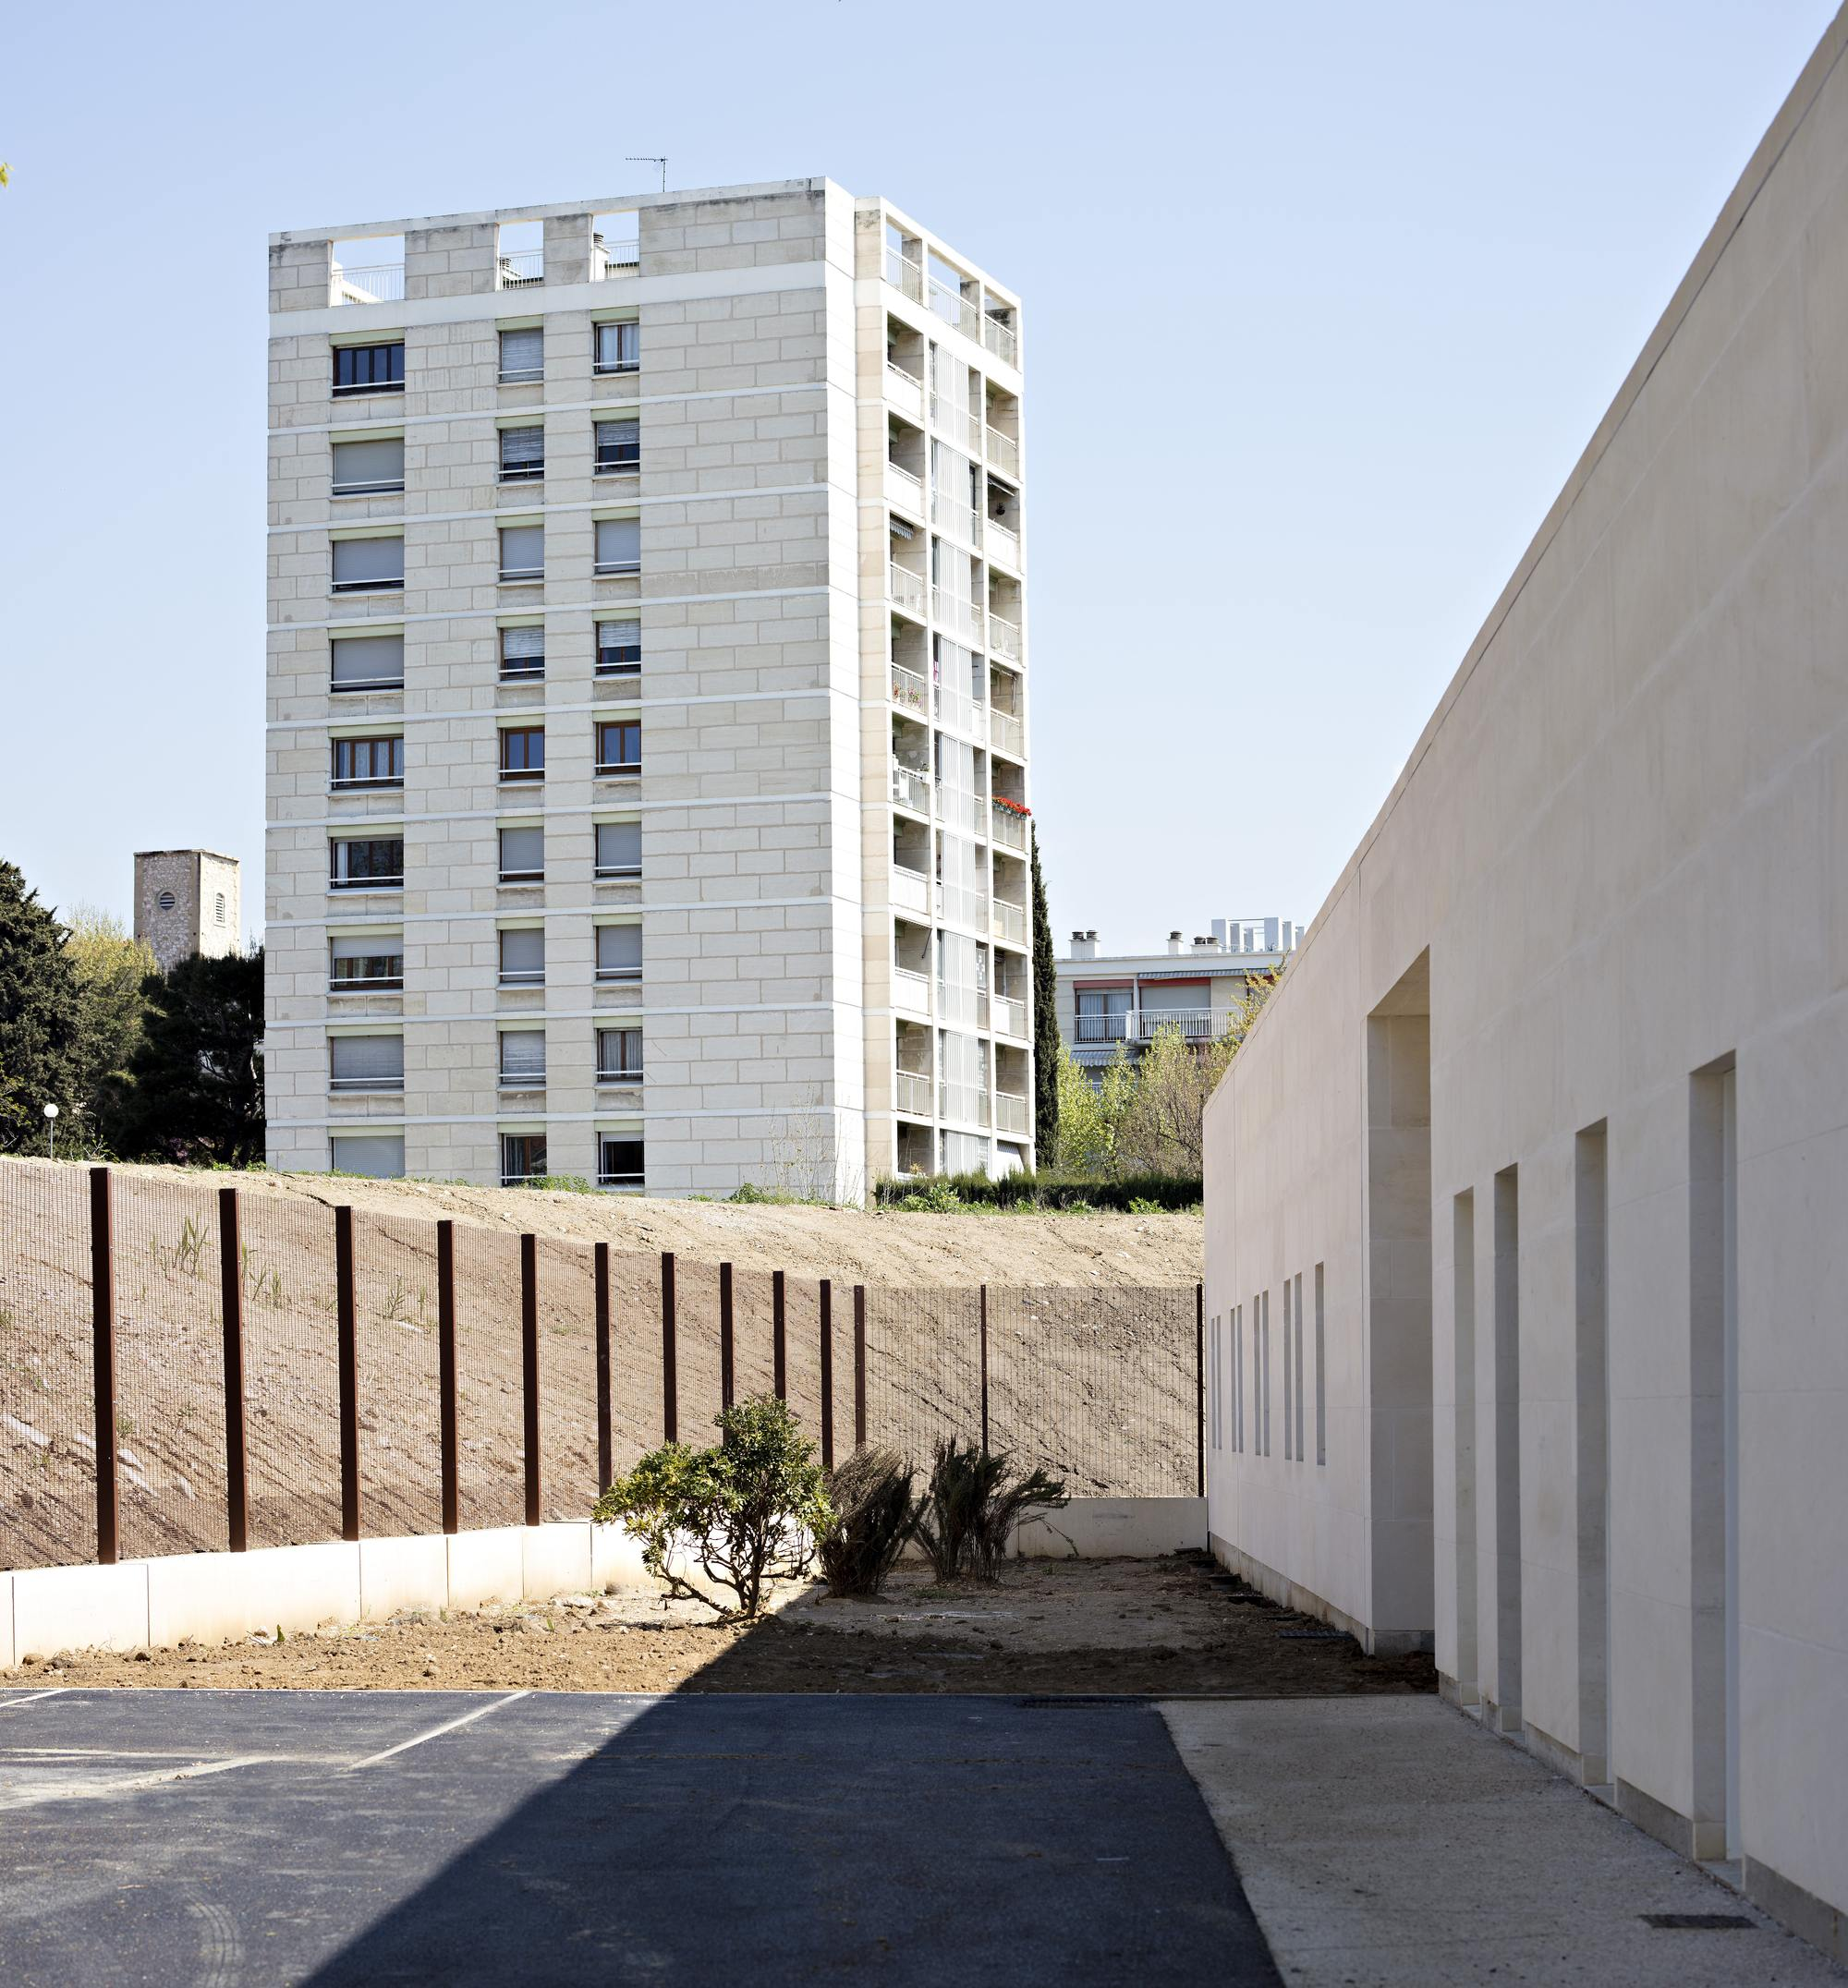 galer a de centro de detenci n juvenil educativo combas architectes 15. Black Bedroom Furniture Sets. Home Design Ideas